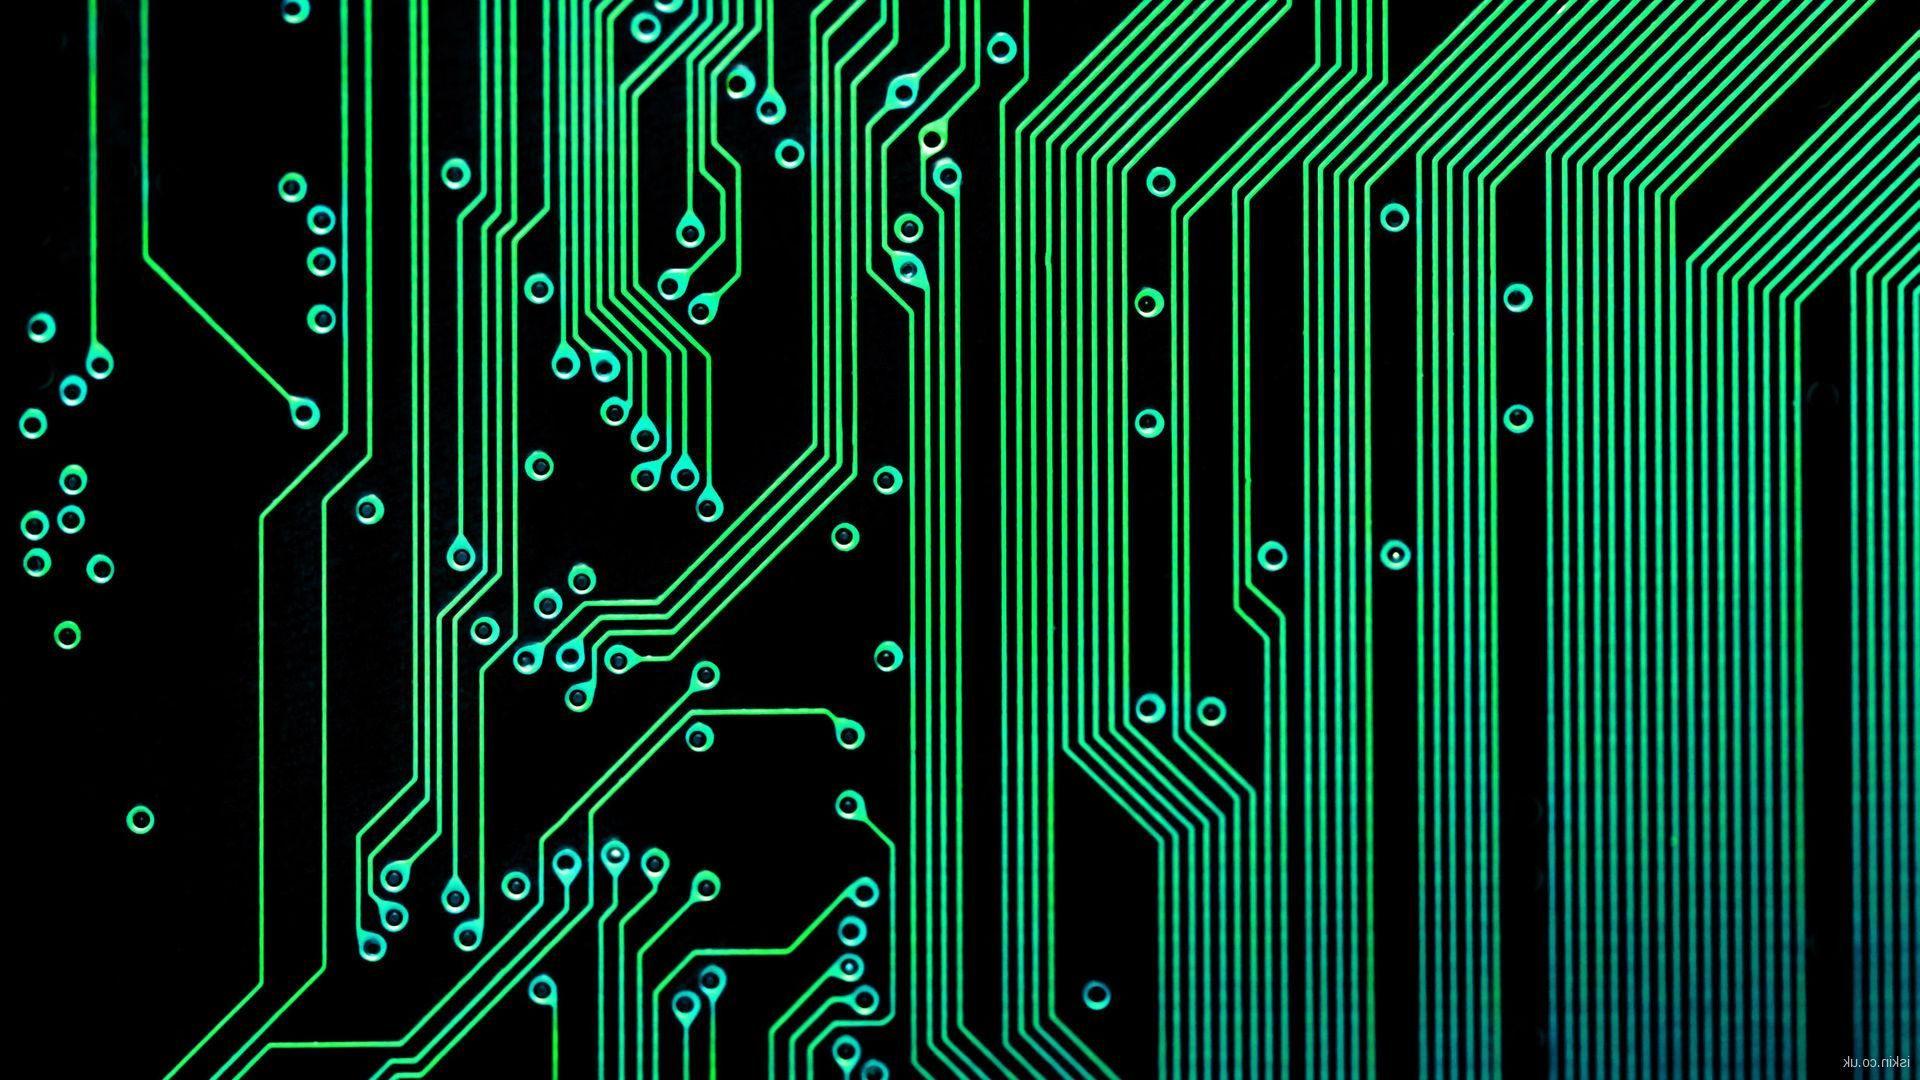 Marvelous Electronics Circuit Wallpaper Cablo Commongroundsapex Co Wiring Cloud Orsalboapumohammedshrineorg